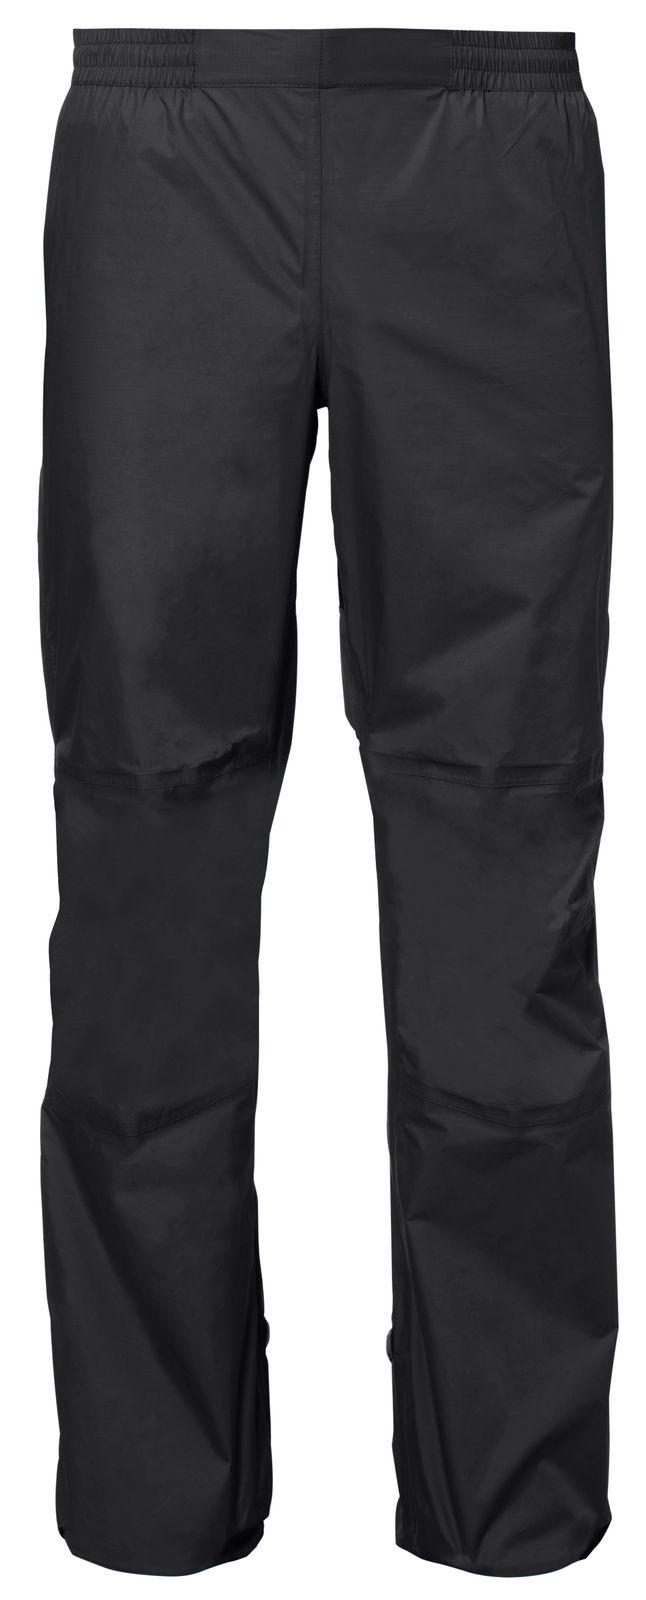 Pantalon imperméable avec membrane imper-respirante HOGGAR 2-F Femme Noir